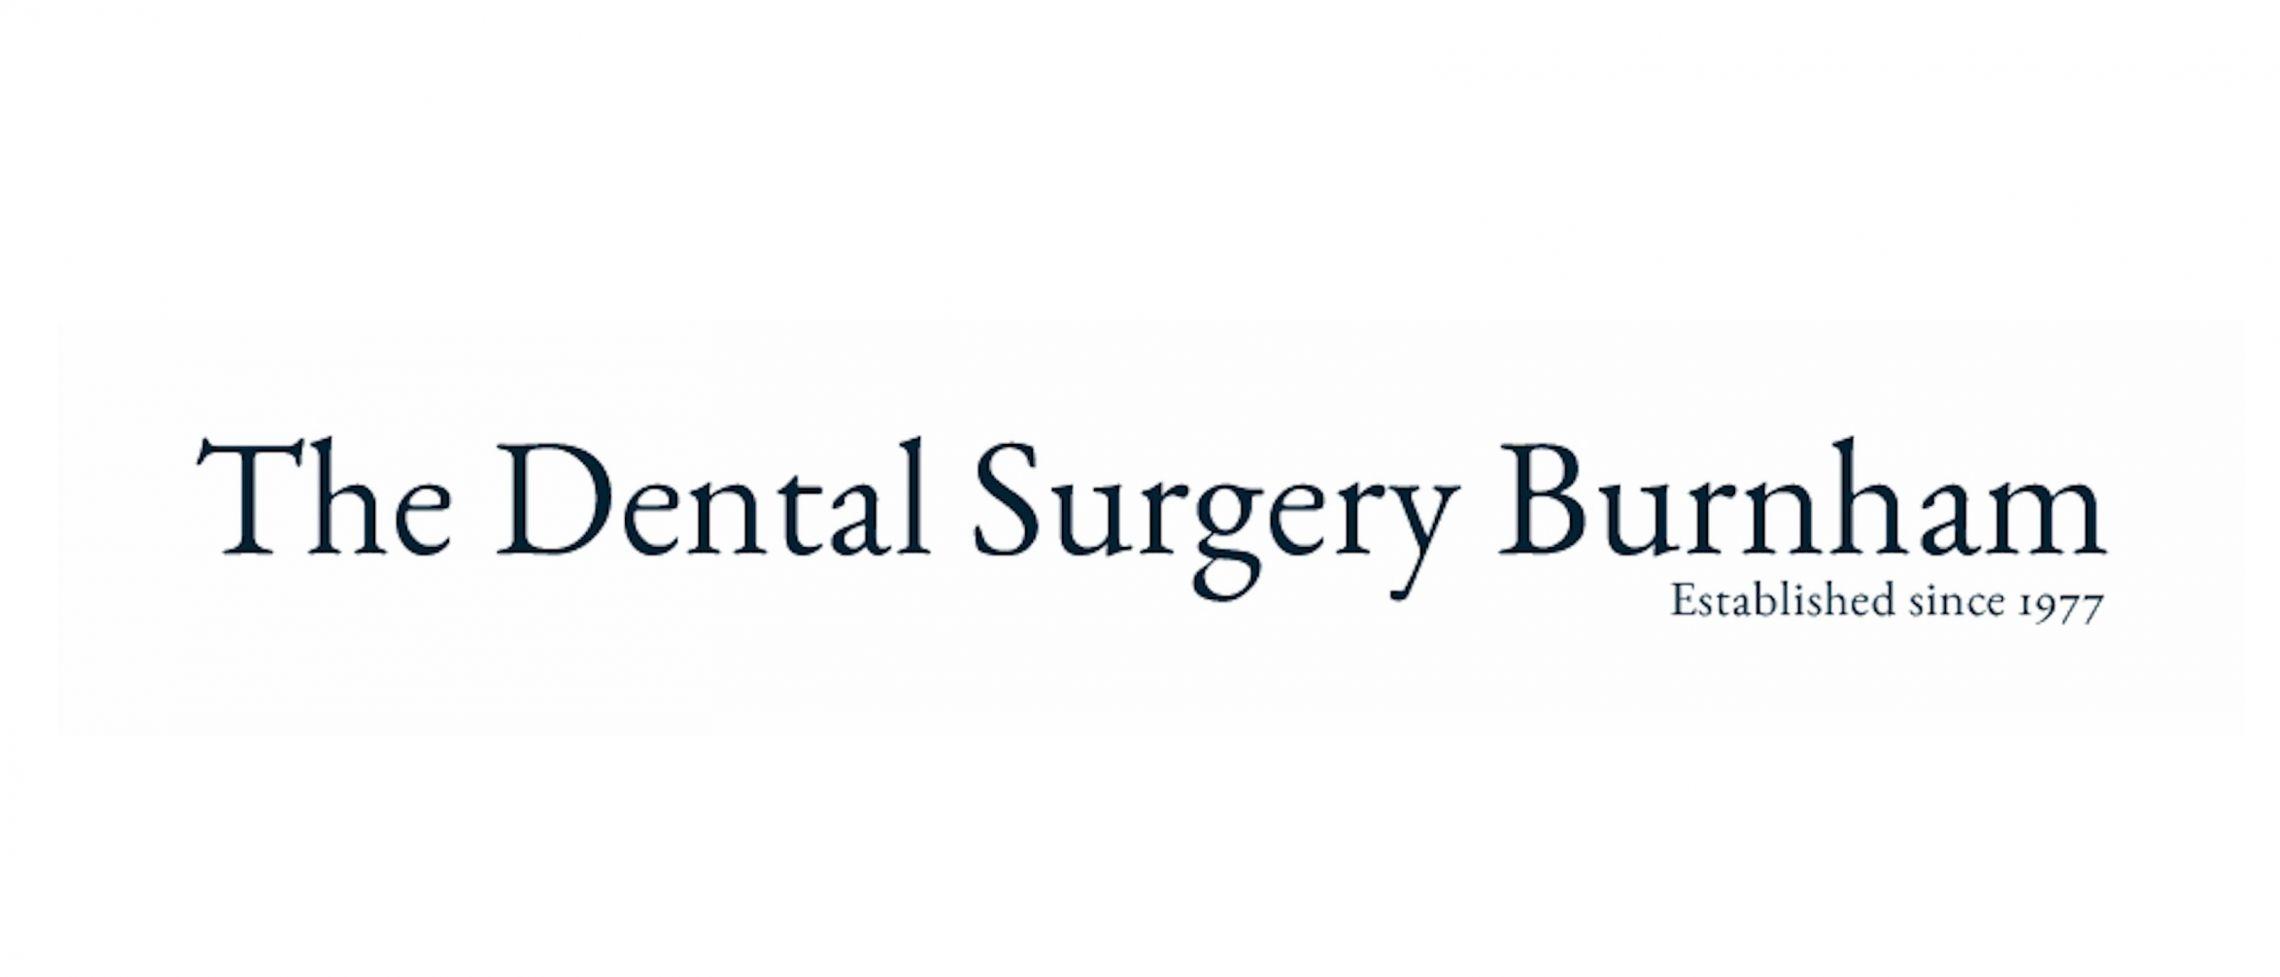 The Dental Surgery Burnham - The MiSmile Network